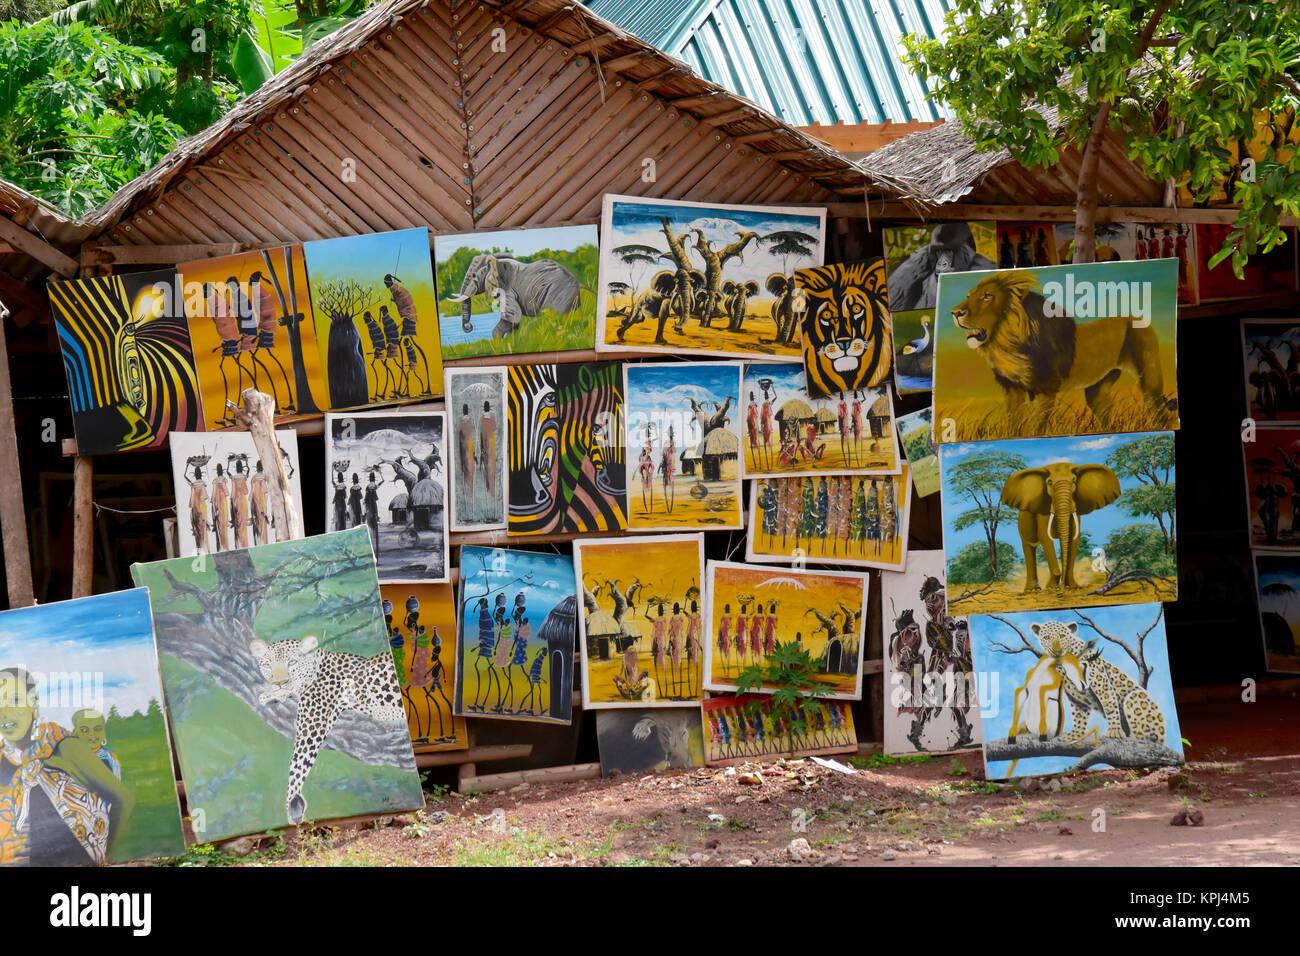 Tourist shops in Mto wa Mbu in the rift valley, Tanzania Stock Photo